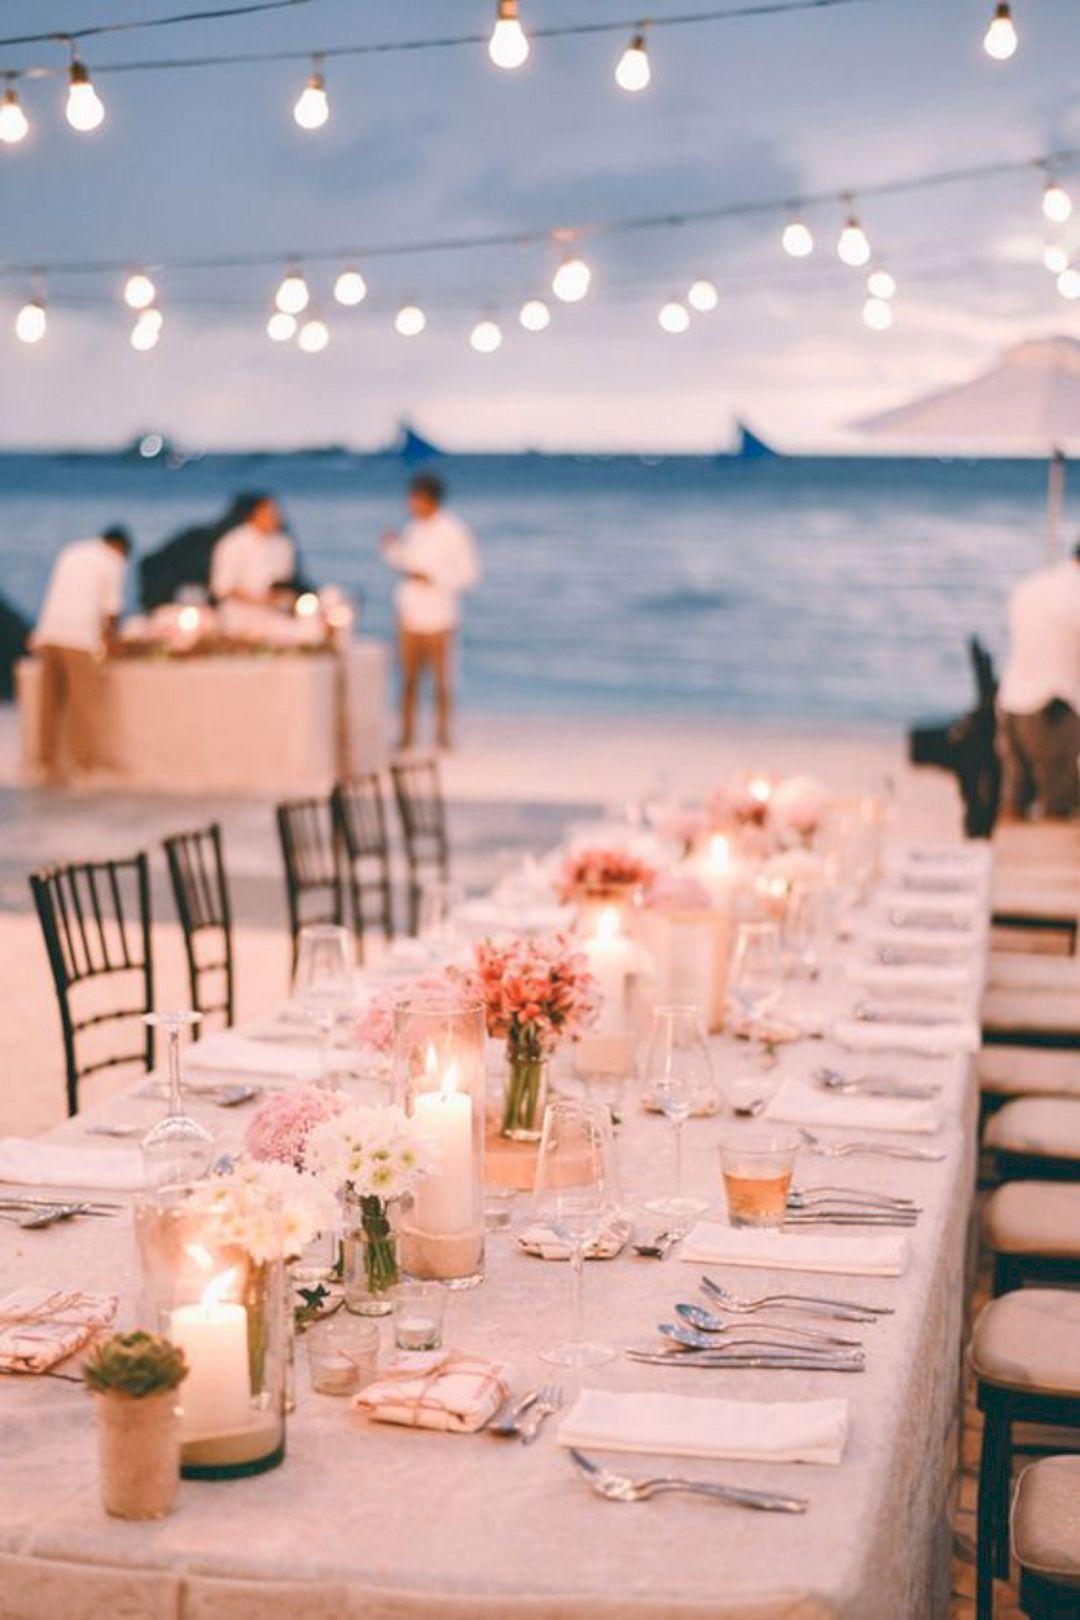 Beach wedding decoration ideas  Pin by Nguyen Trang on Love  Pinterest  Beach weddings Weddings